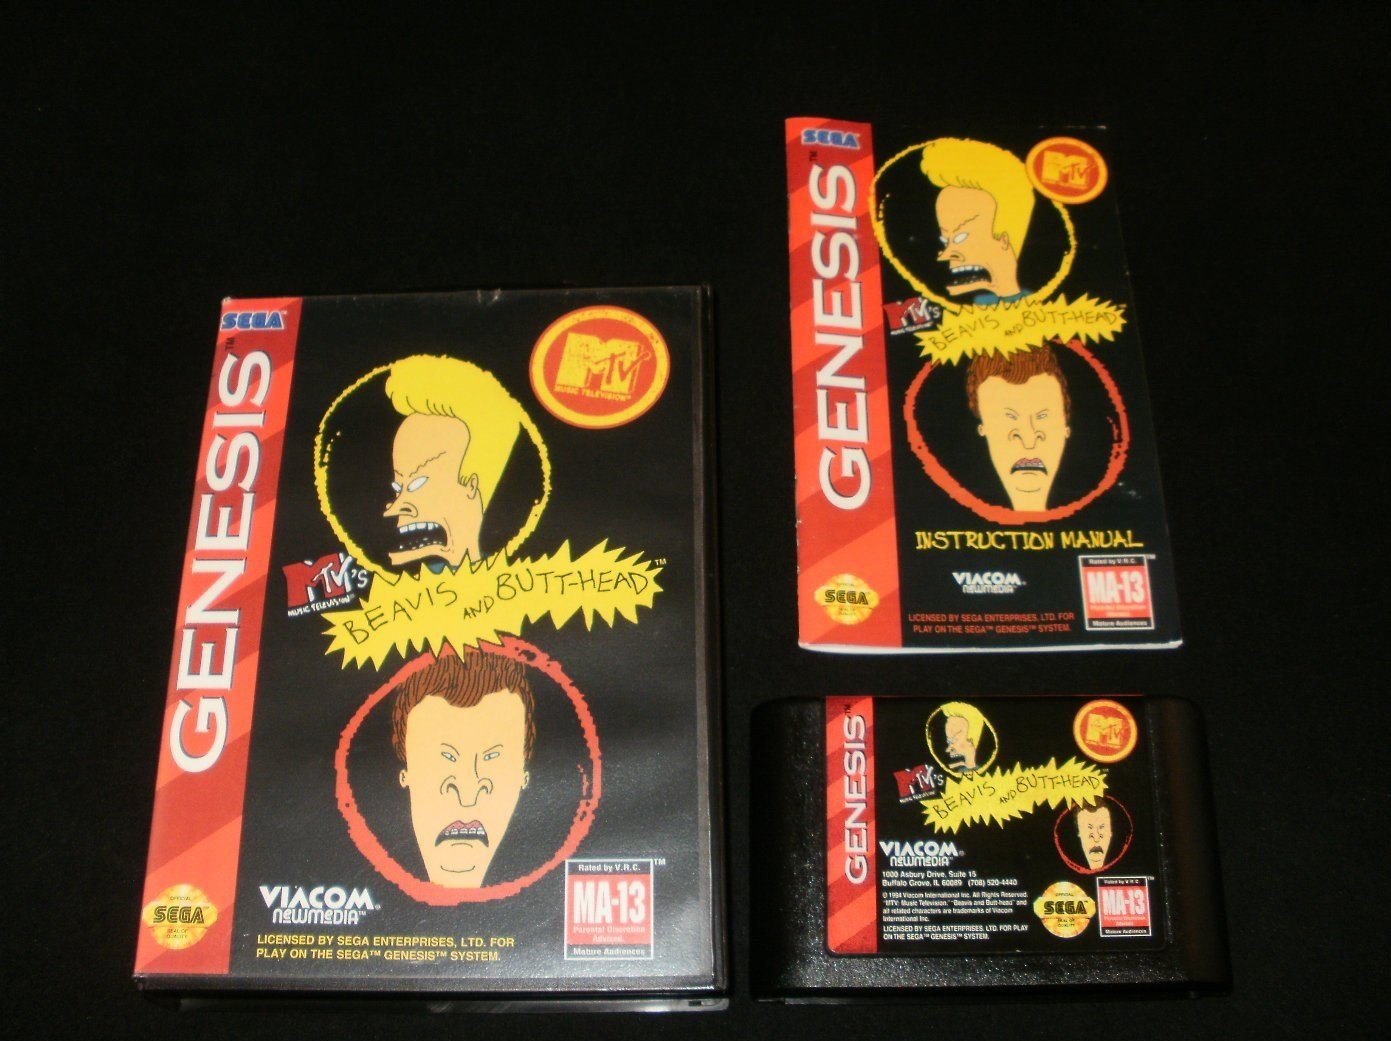 Beavis and Butt-head - Sega Genesis - Complete CIB